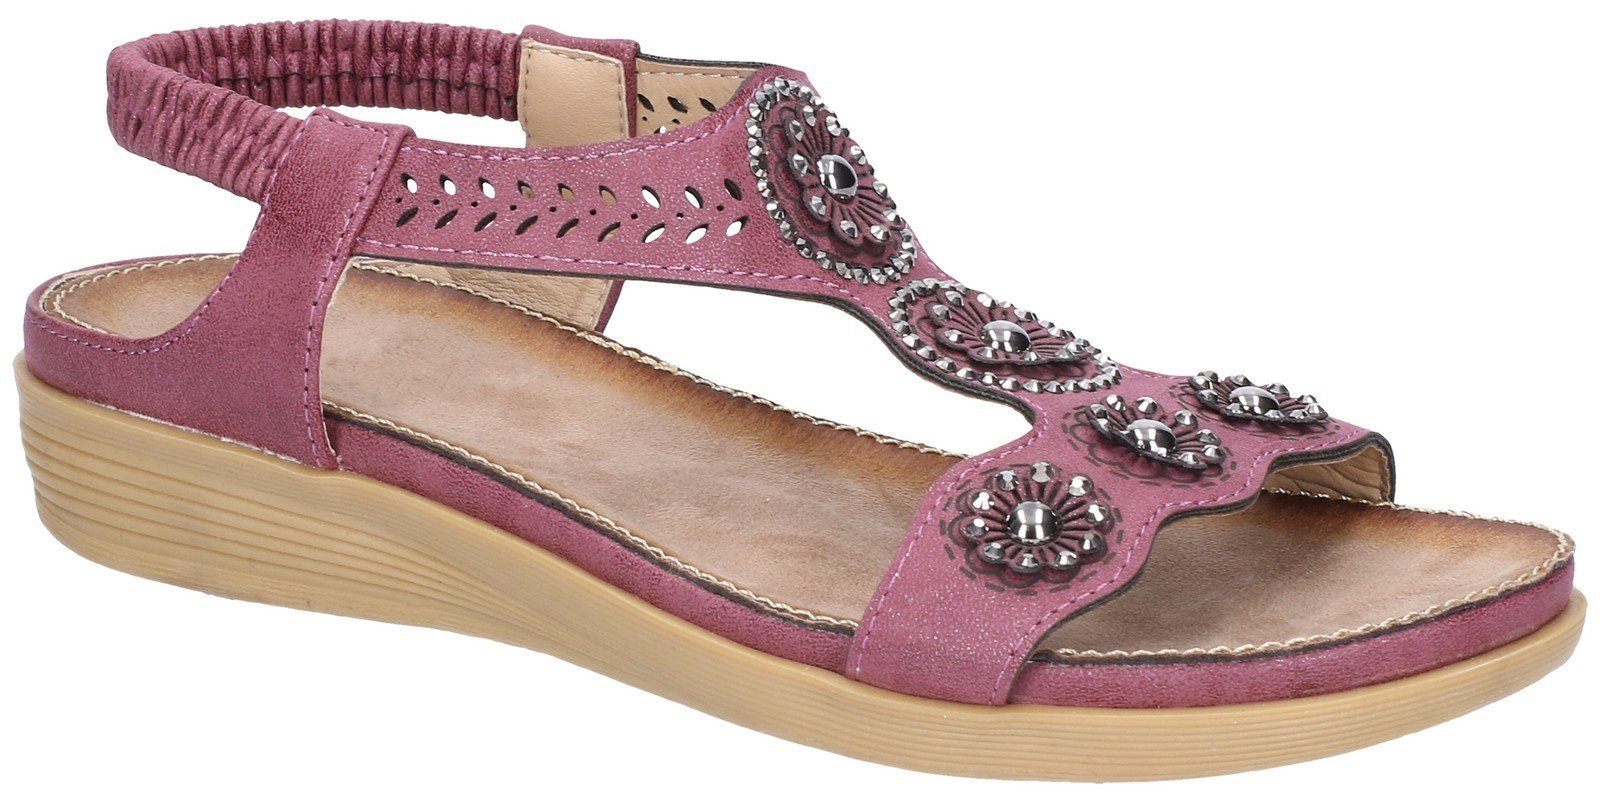 Fleet & Foster Women's Caper Elastic T-Bar Sandal Various Colours 28281 - Plum 3